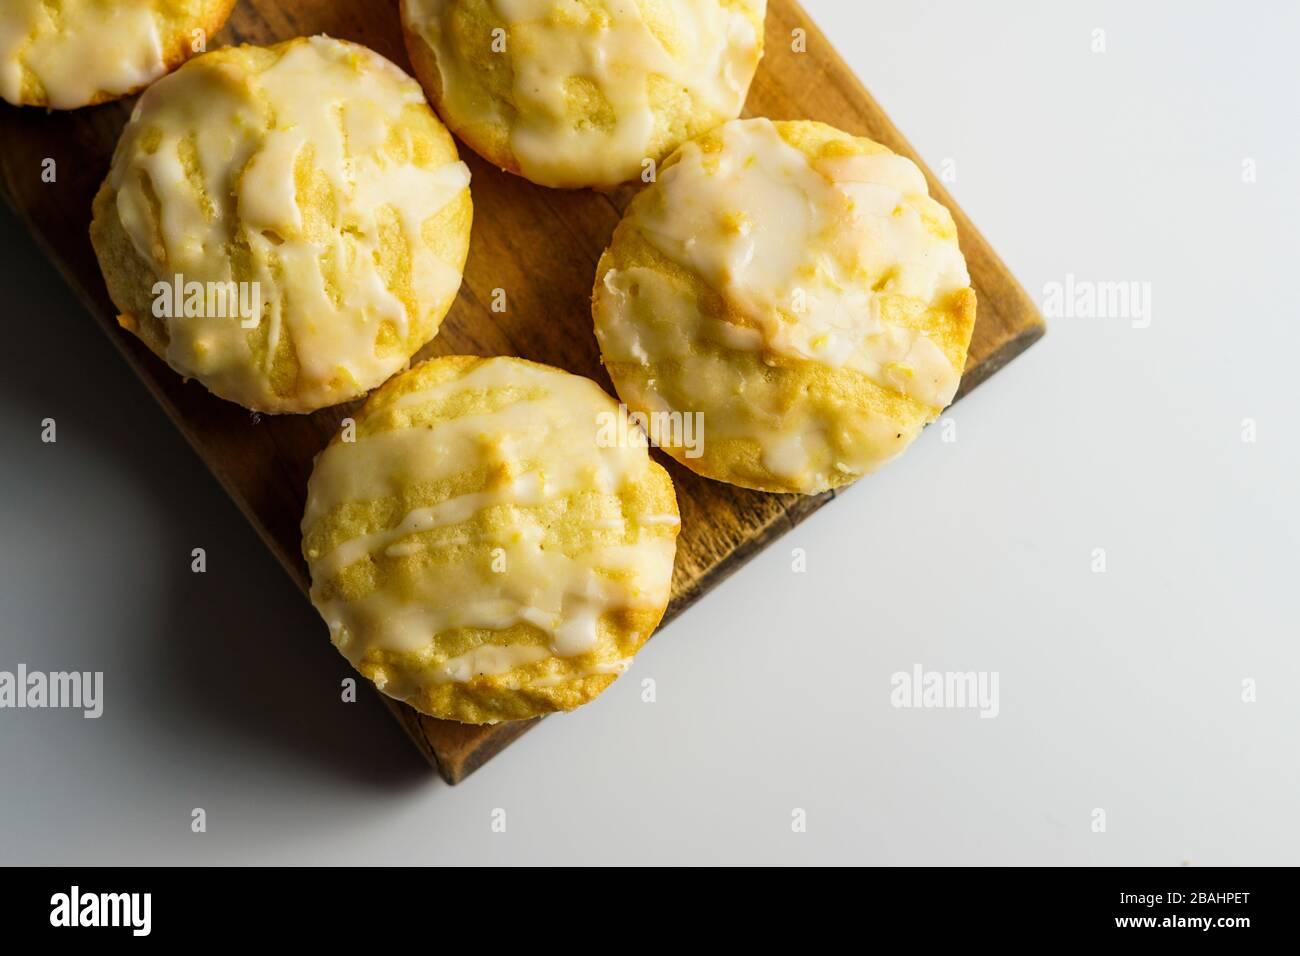 Zitronenmuffins mit Zitronenglasur Stockfoto